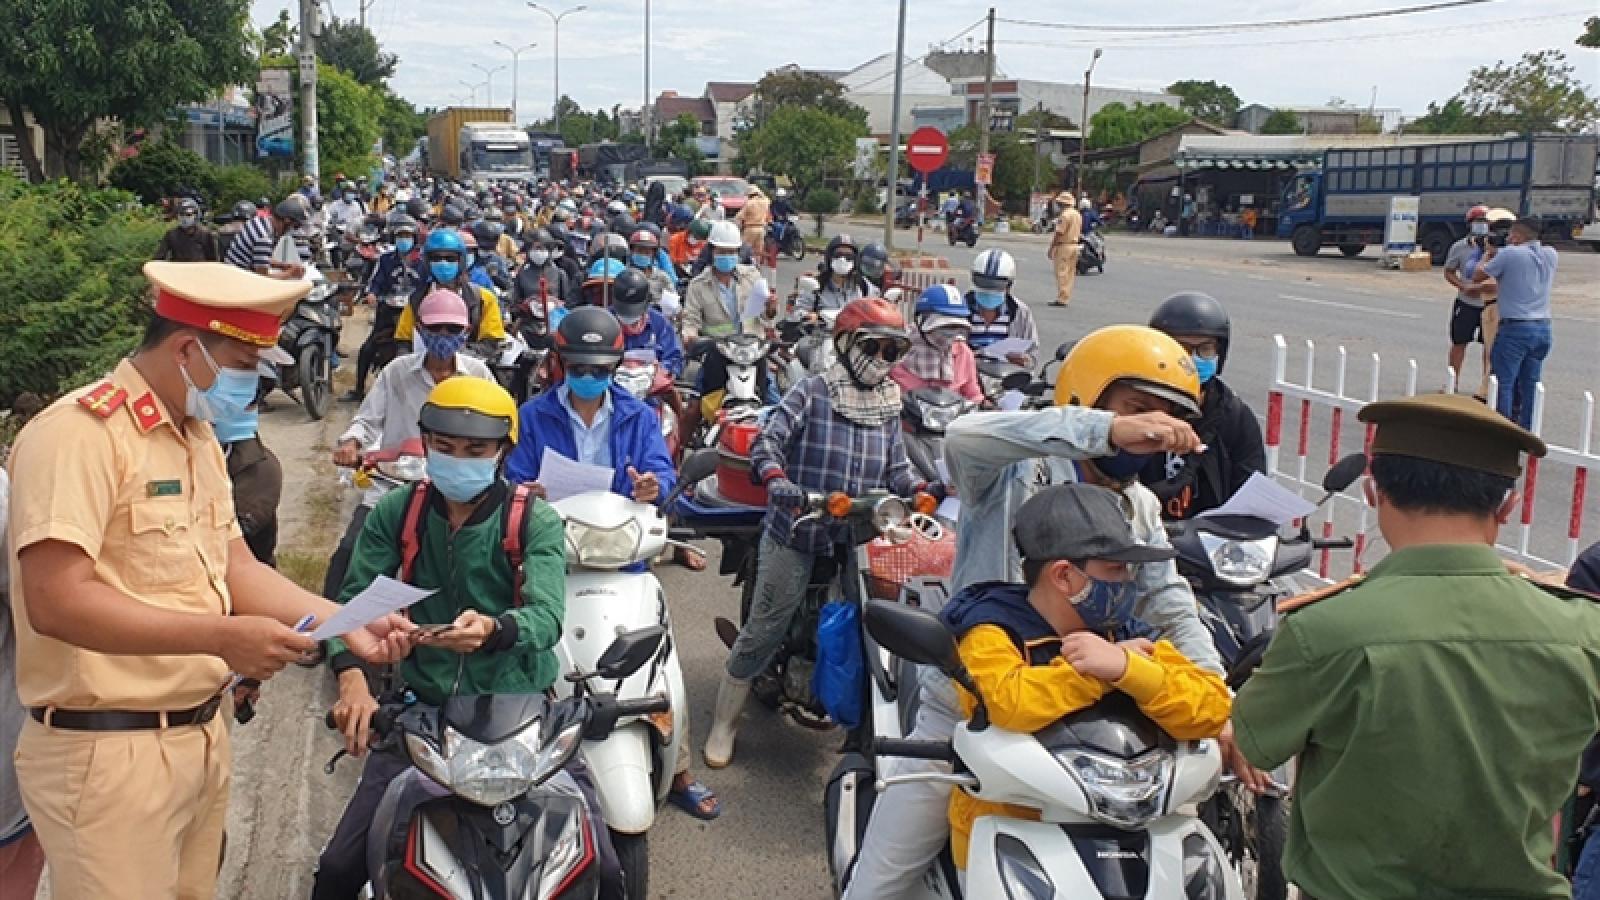 Locals depart Da Nang ahead of tightening COVID-19 control measures